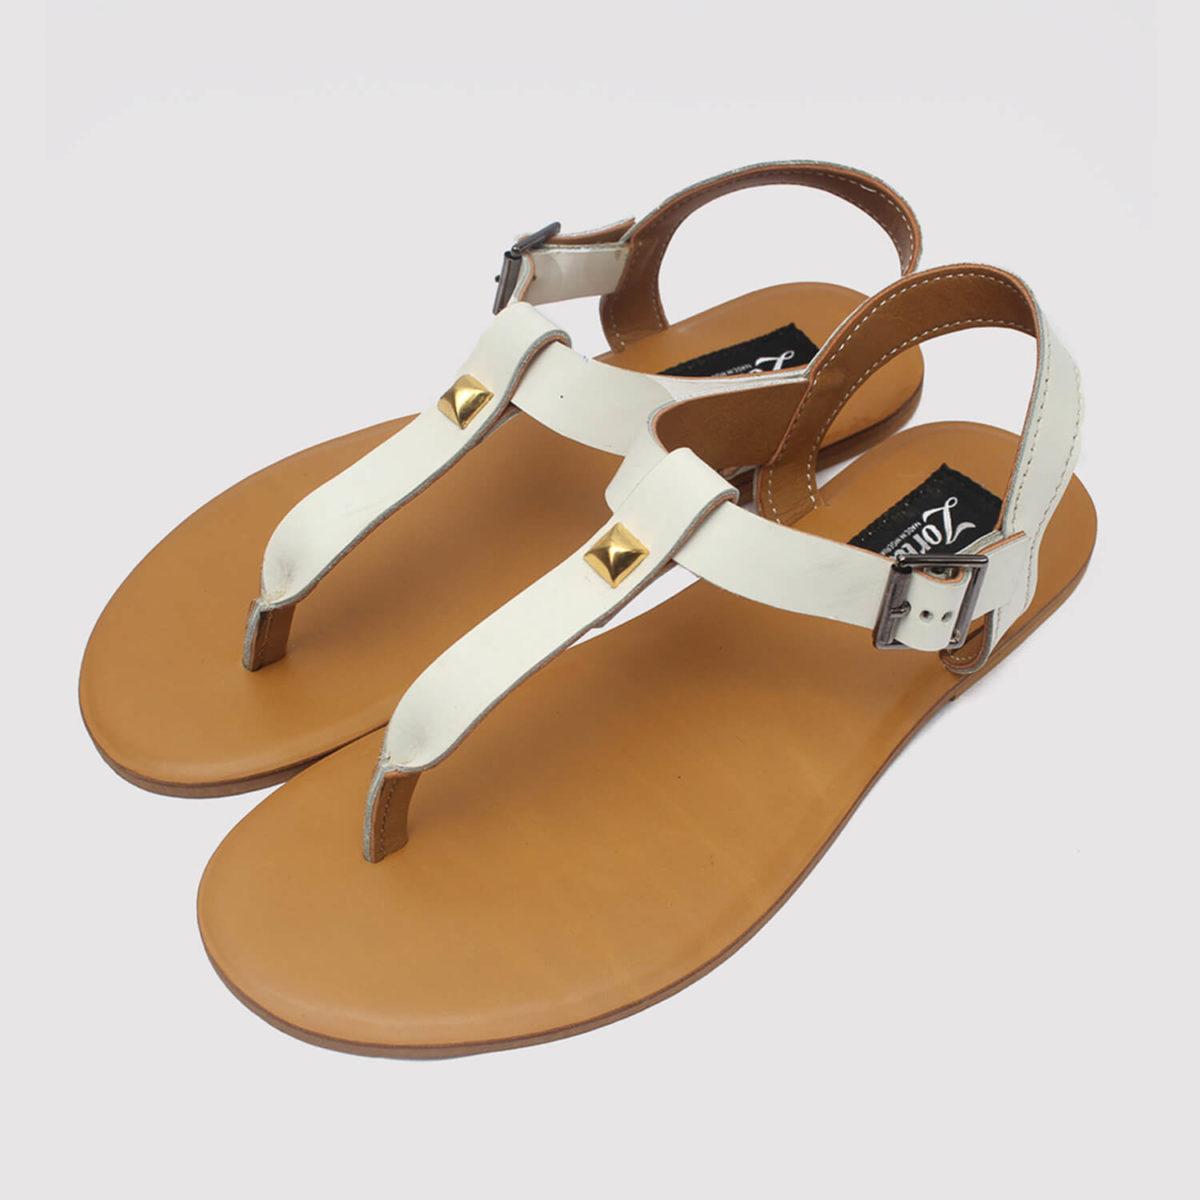 toke sandals white zorkle shoes in lagos nigeria